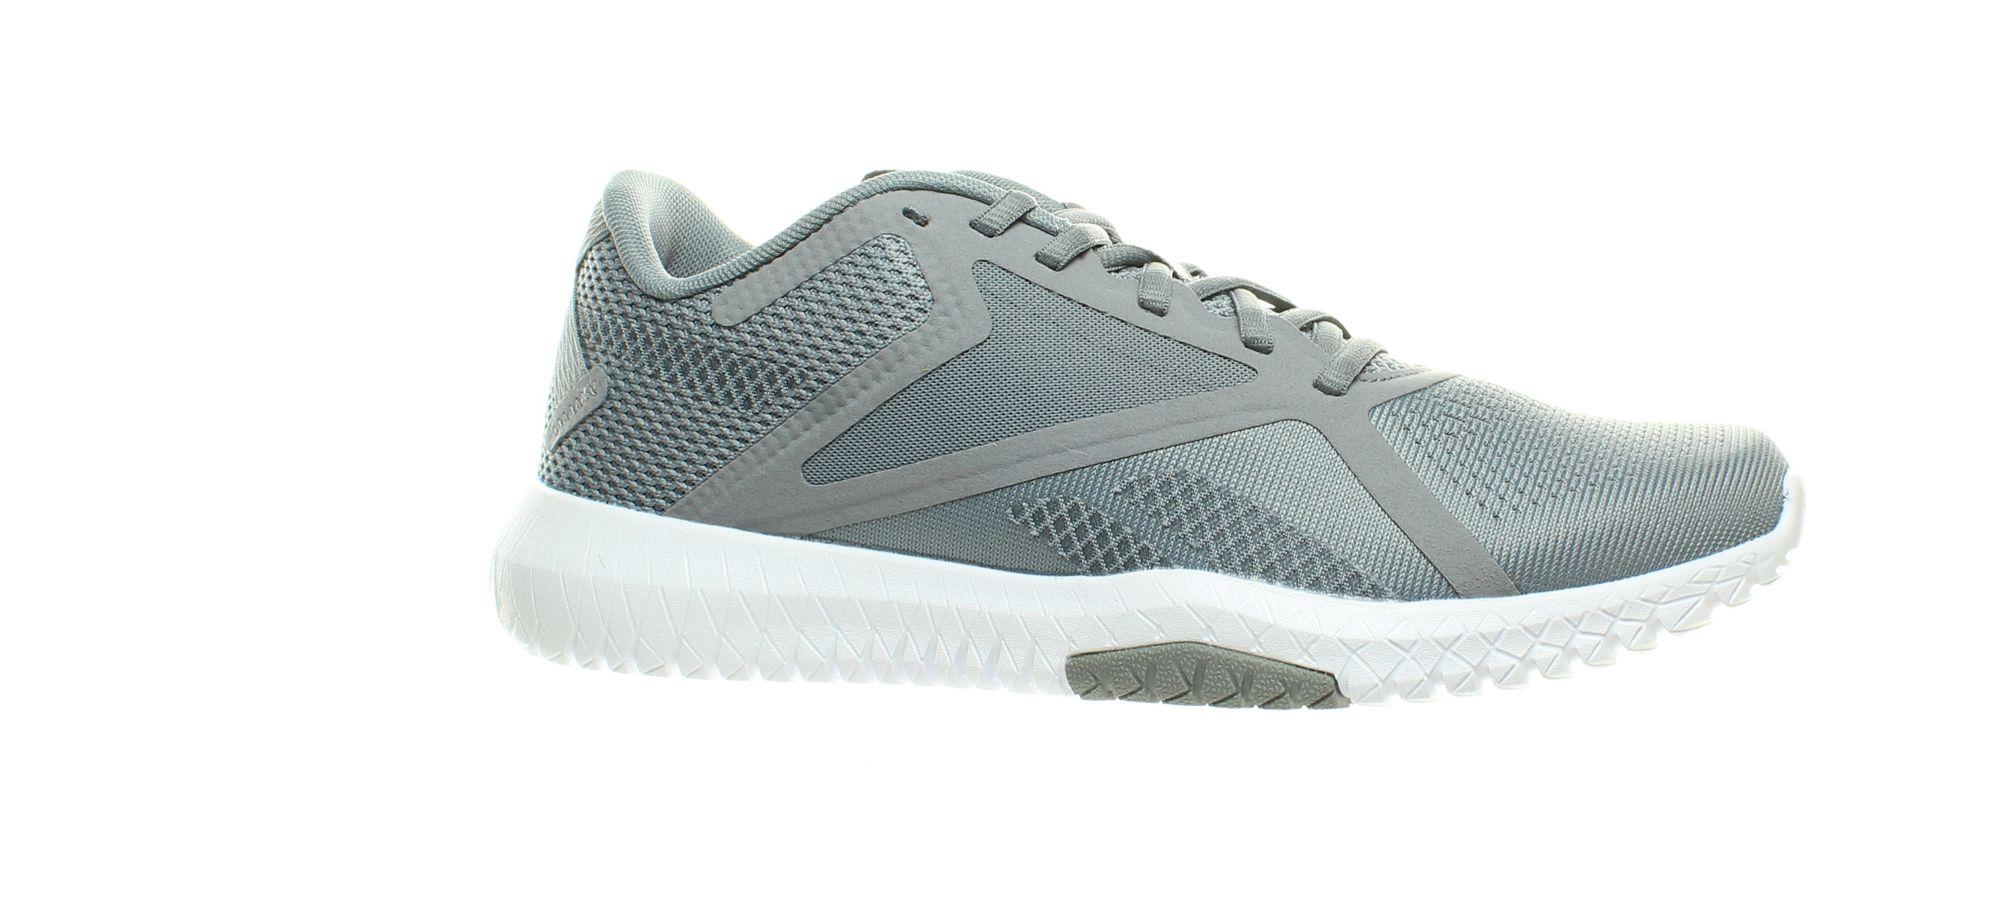 Reebok Flexagon Force 2.0 EG8761 Mens Gray Canvas Athletic Cross Training Shoes